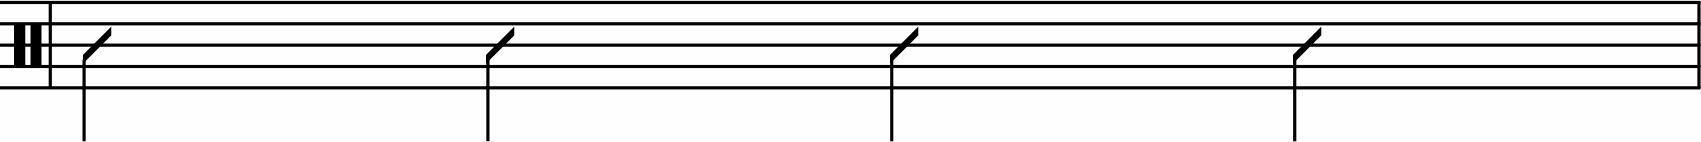 Quarter-note rhythm example.